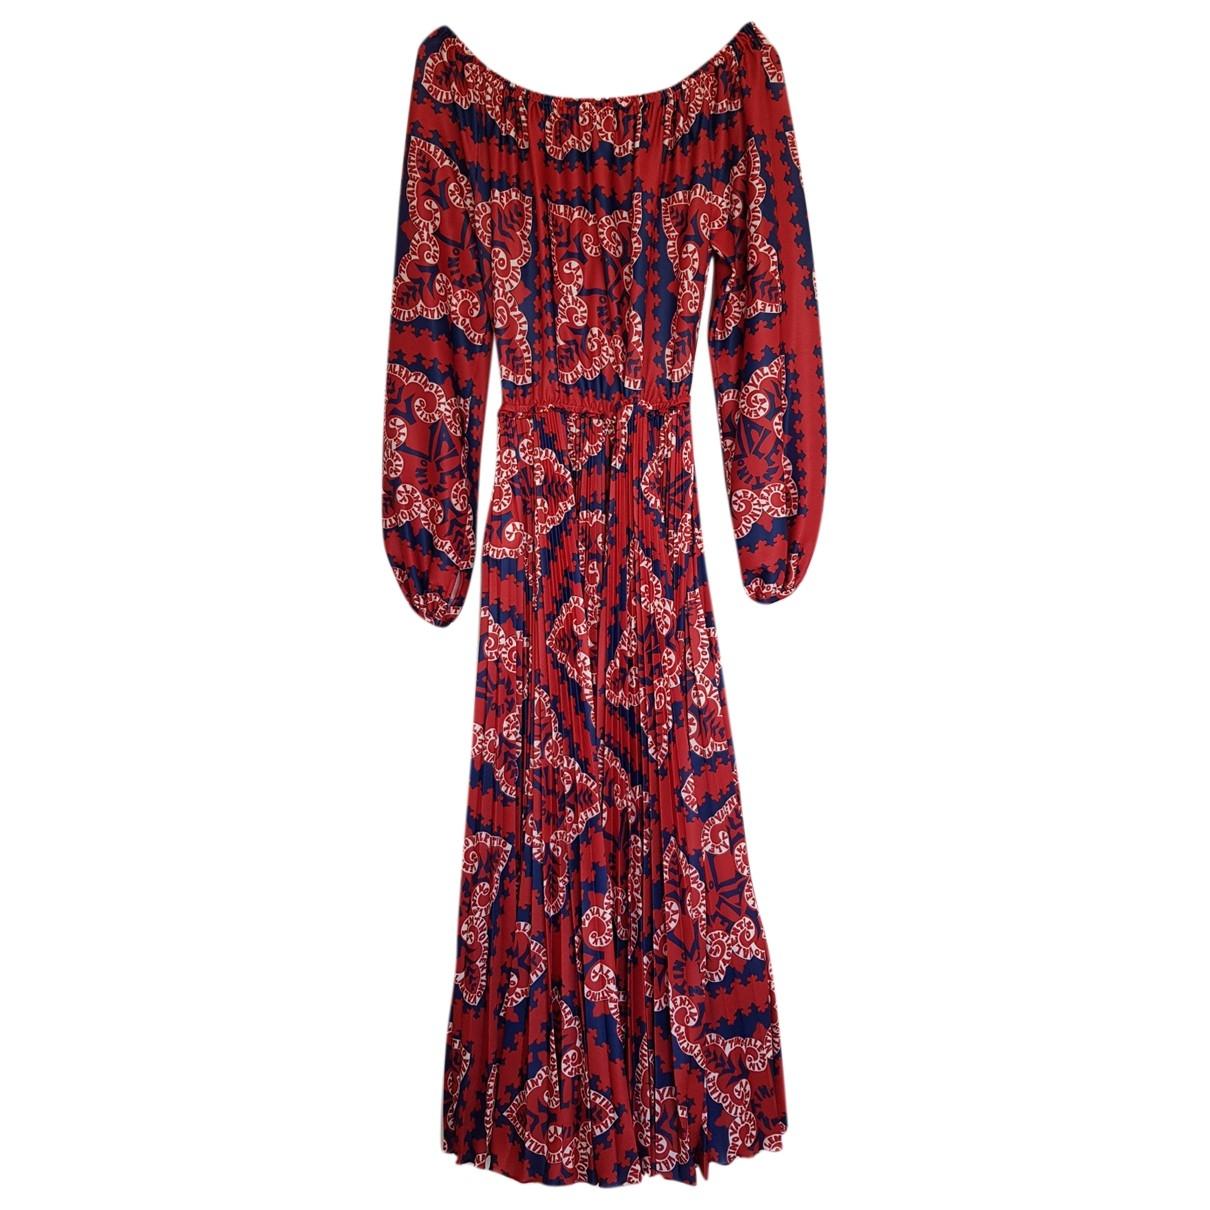 Valentino Garavani \N Red Silk dress for Women S